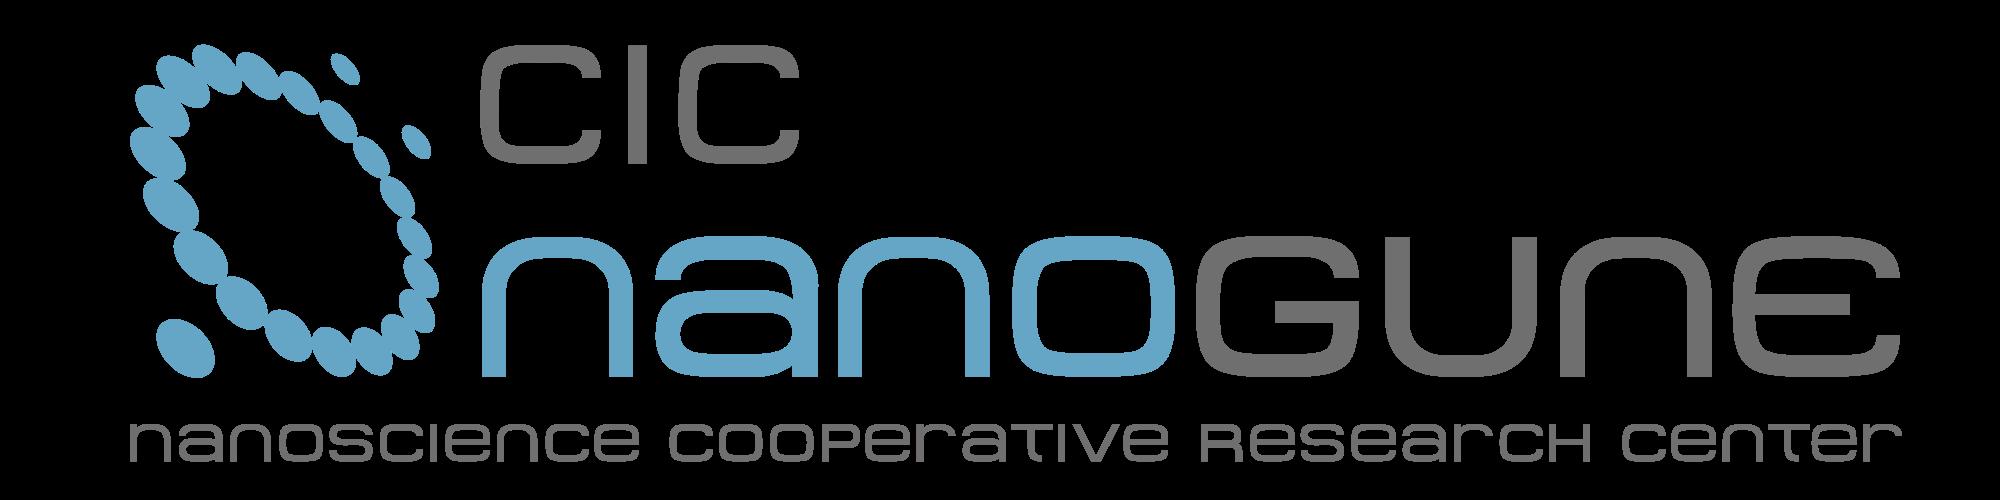 Logotipo de CIC nanoGUNE